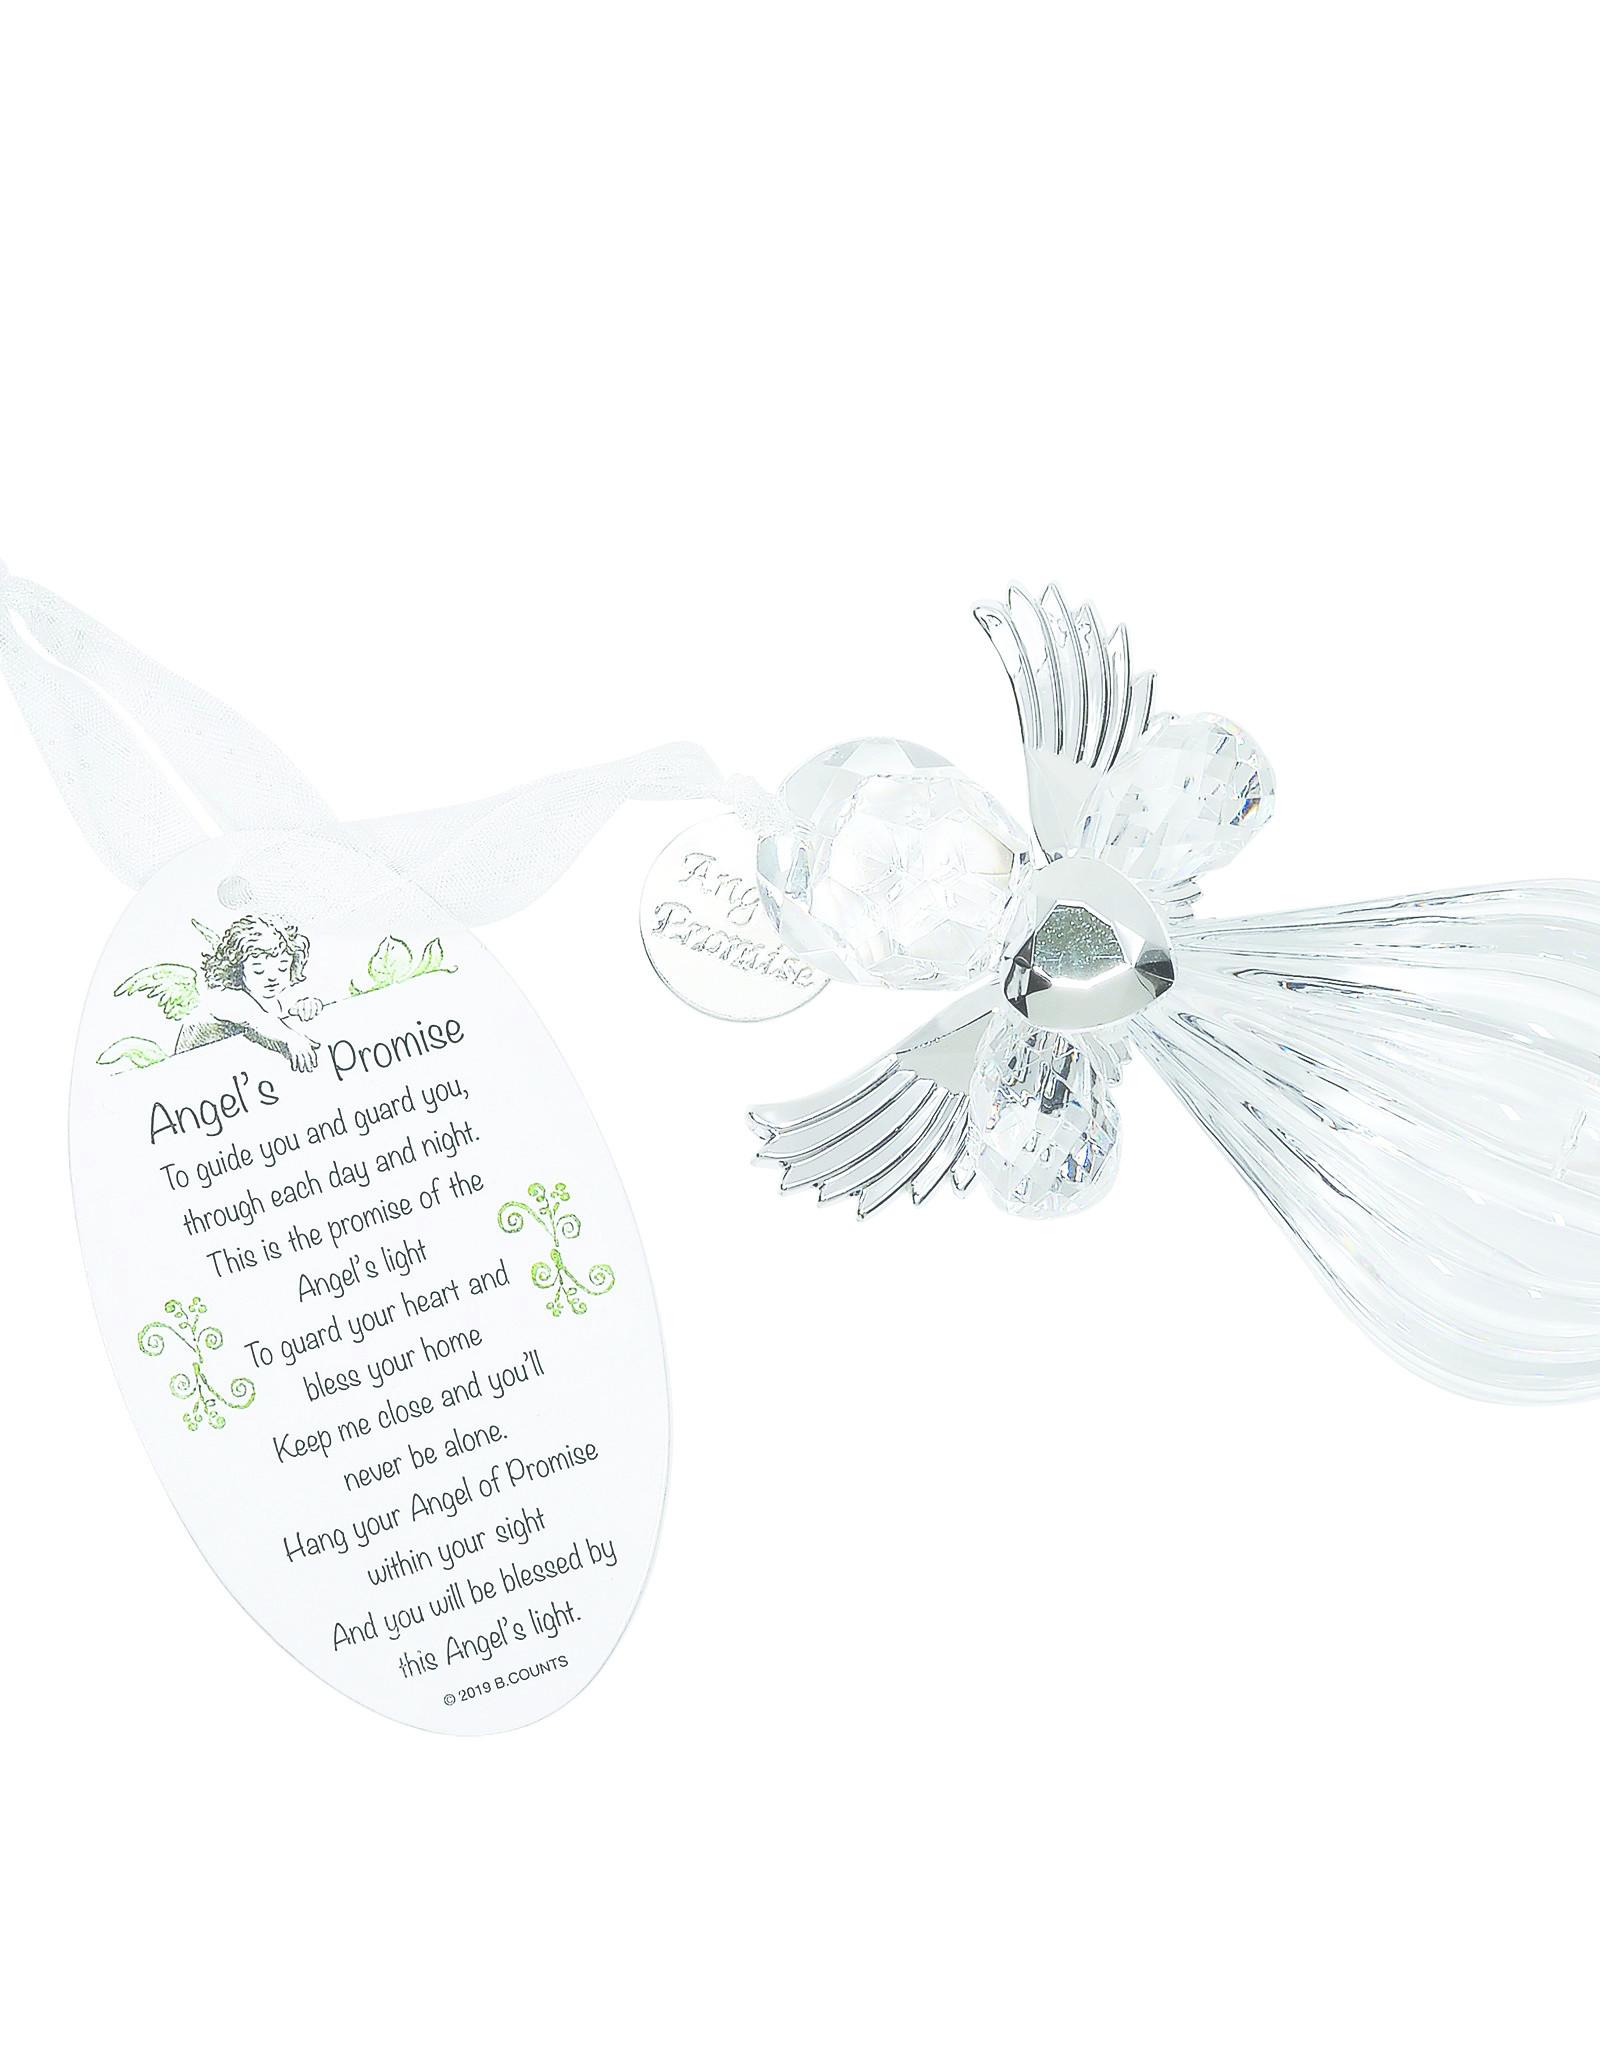 ENESCO Angel's Promise Ornament